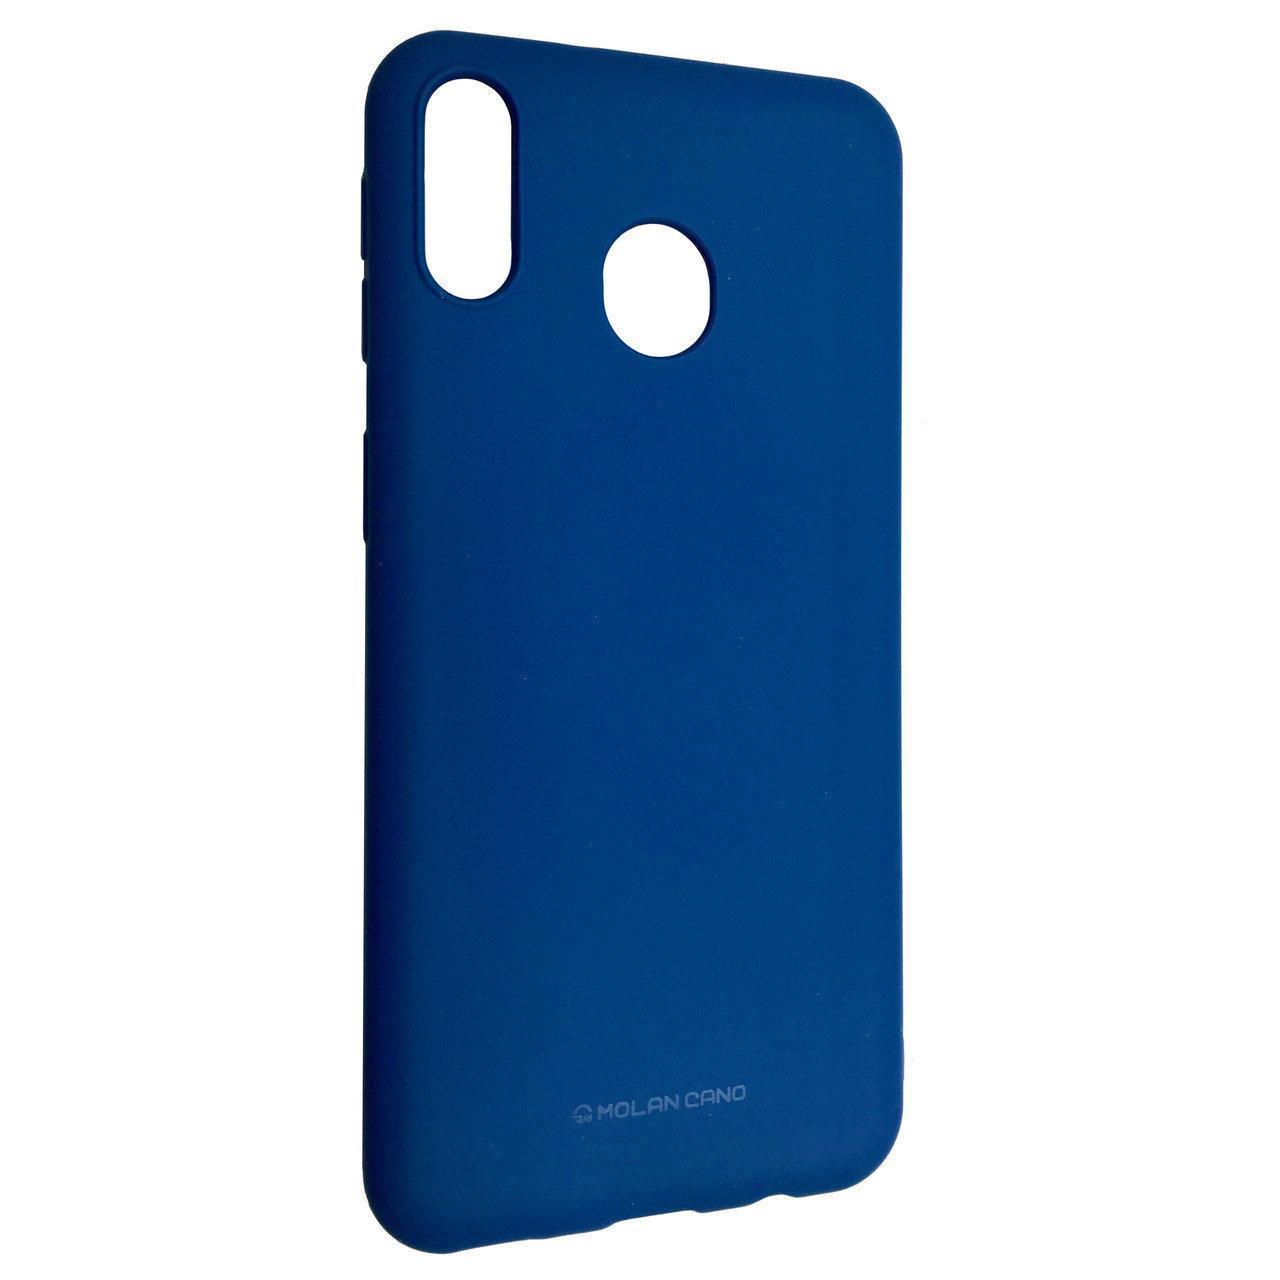 Чехол Silicone Hana Molan Cano Samsung M30 (blue)